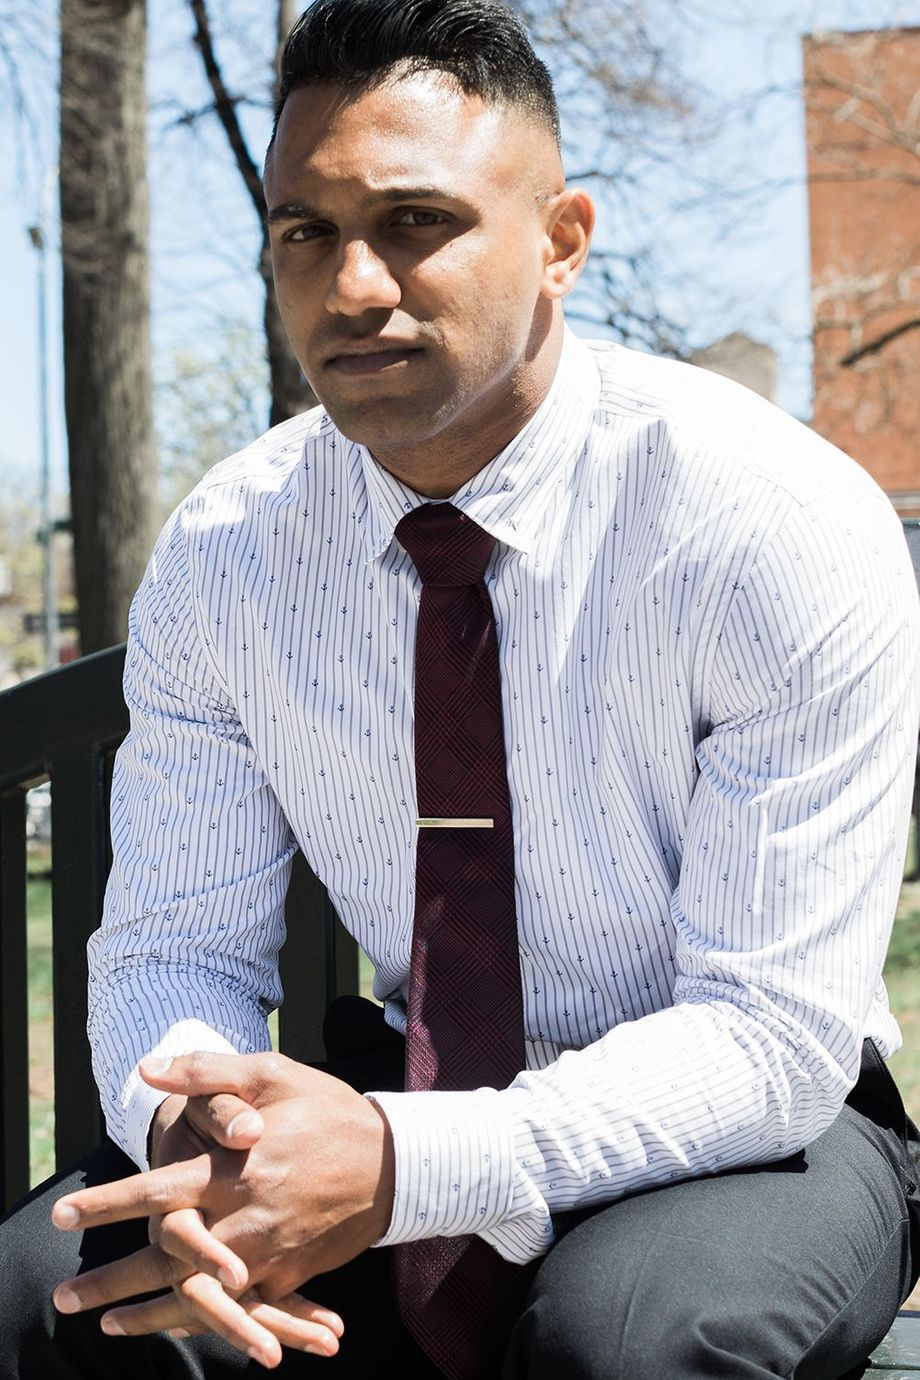 Democratic Socialists of America member Shaniyat Chowdhury is running for Congress against incumbent Rep. Gregory Meeks.